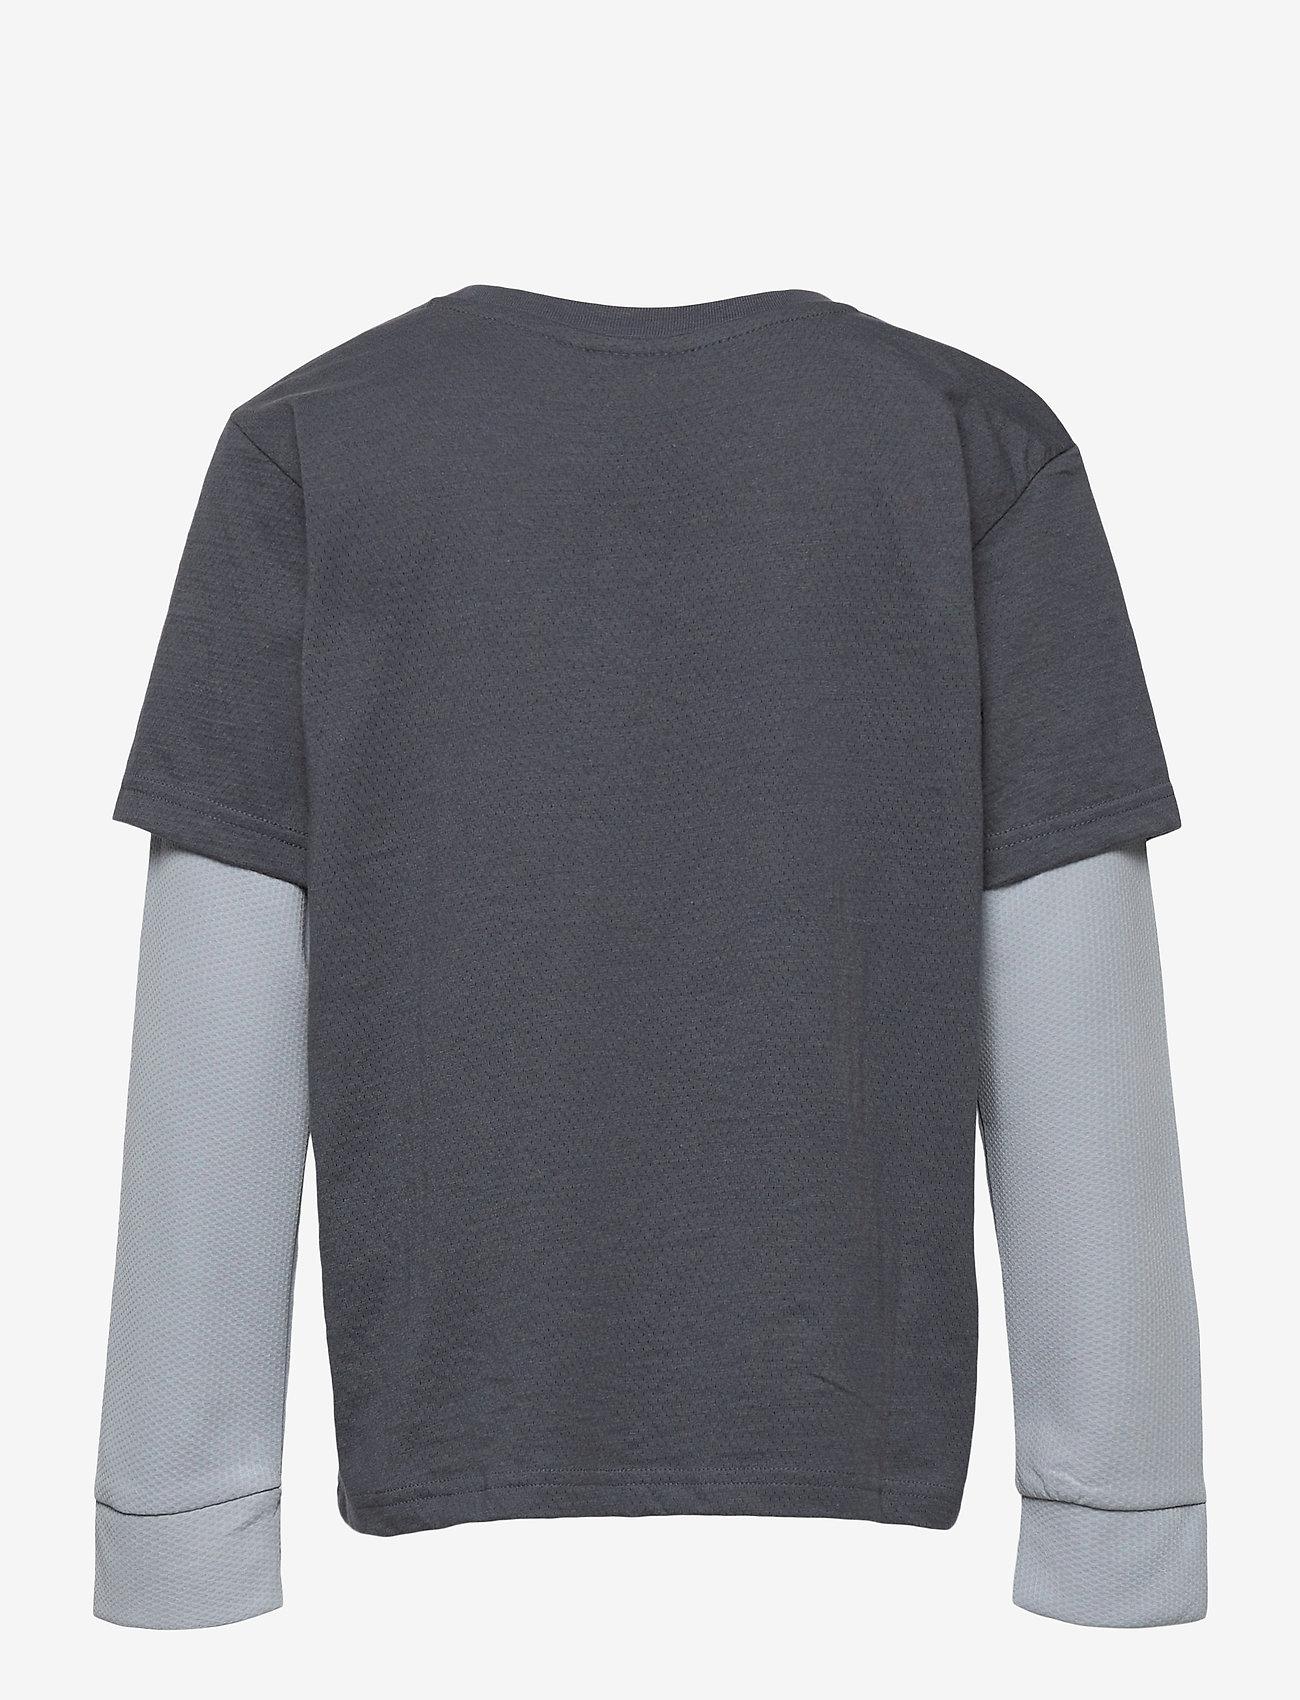 Hummel - hmlMALTE T-SHIRT L/S - long-sleeved t-shirts - ombre blue - 1